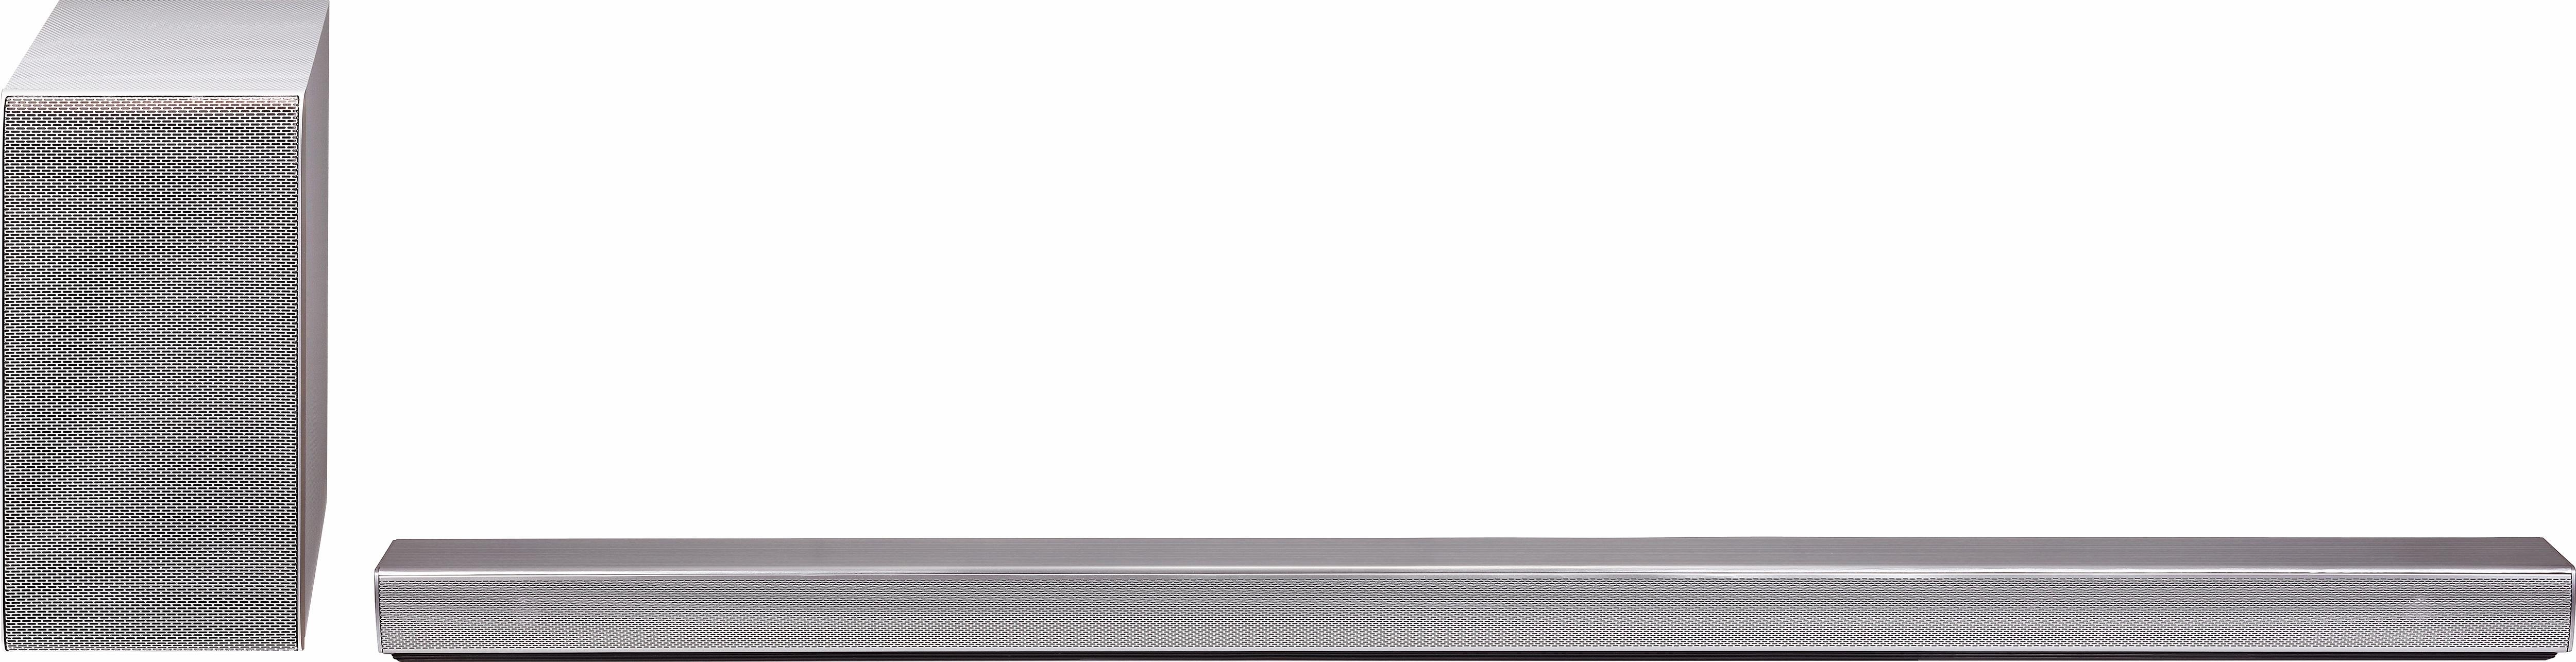 LG DSH9 soundbar, Hi-Res, Bluetooth, MultiRoom online kopen op otto.nl